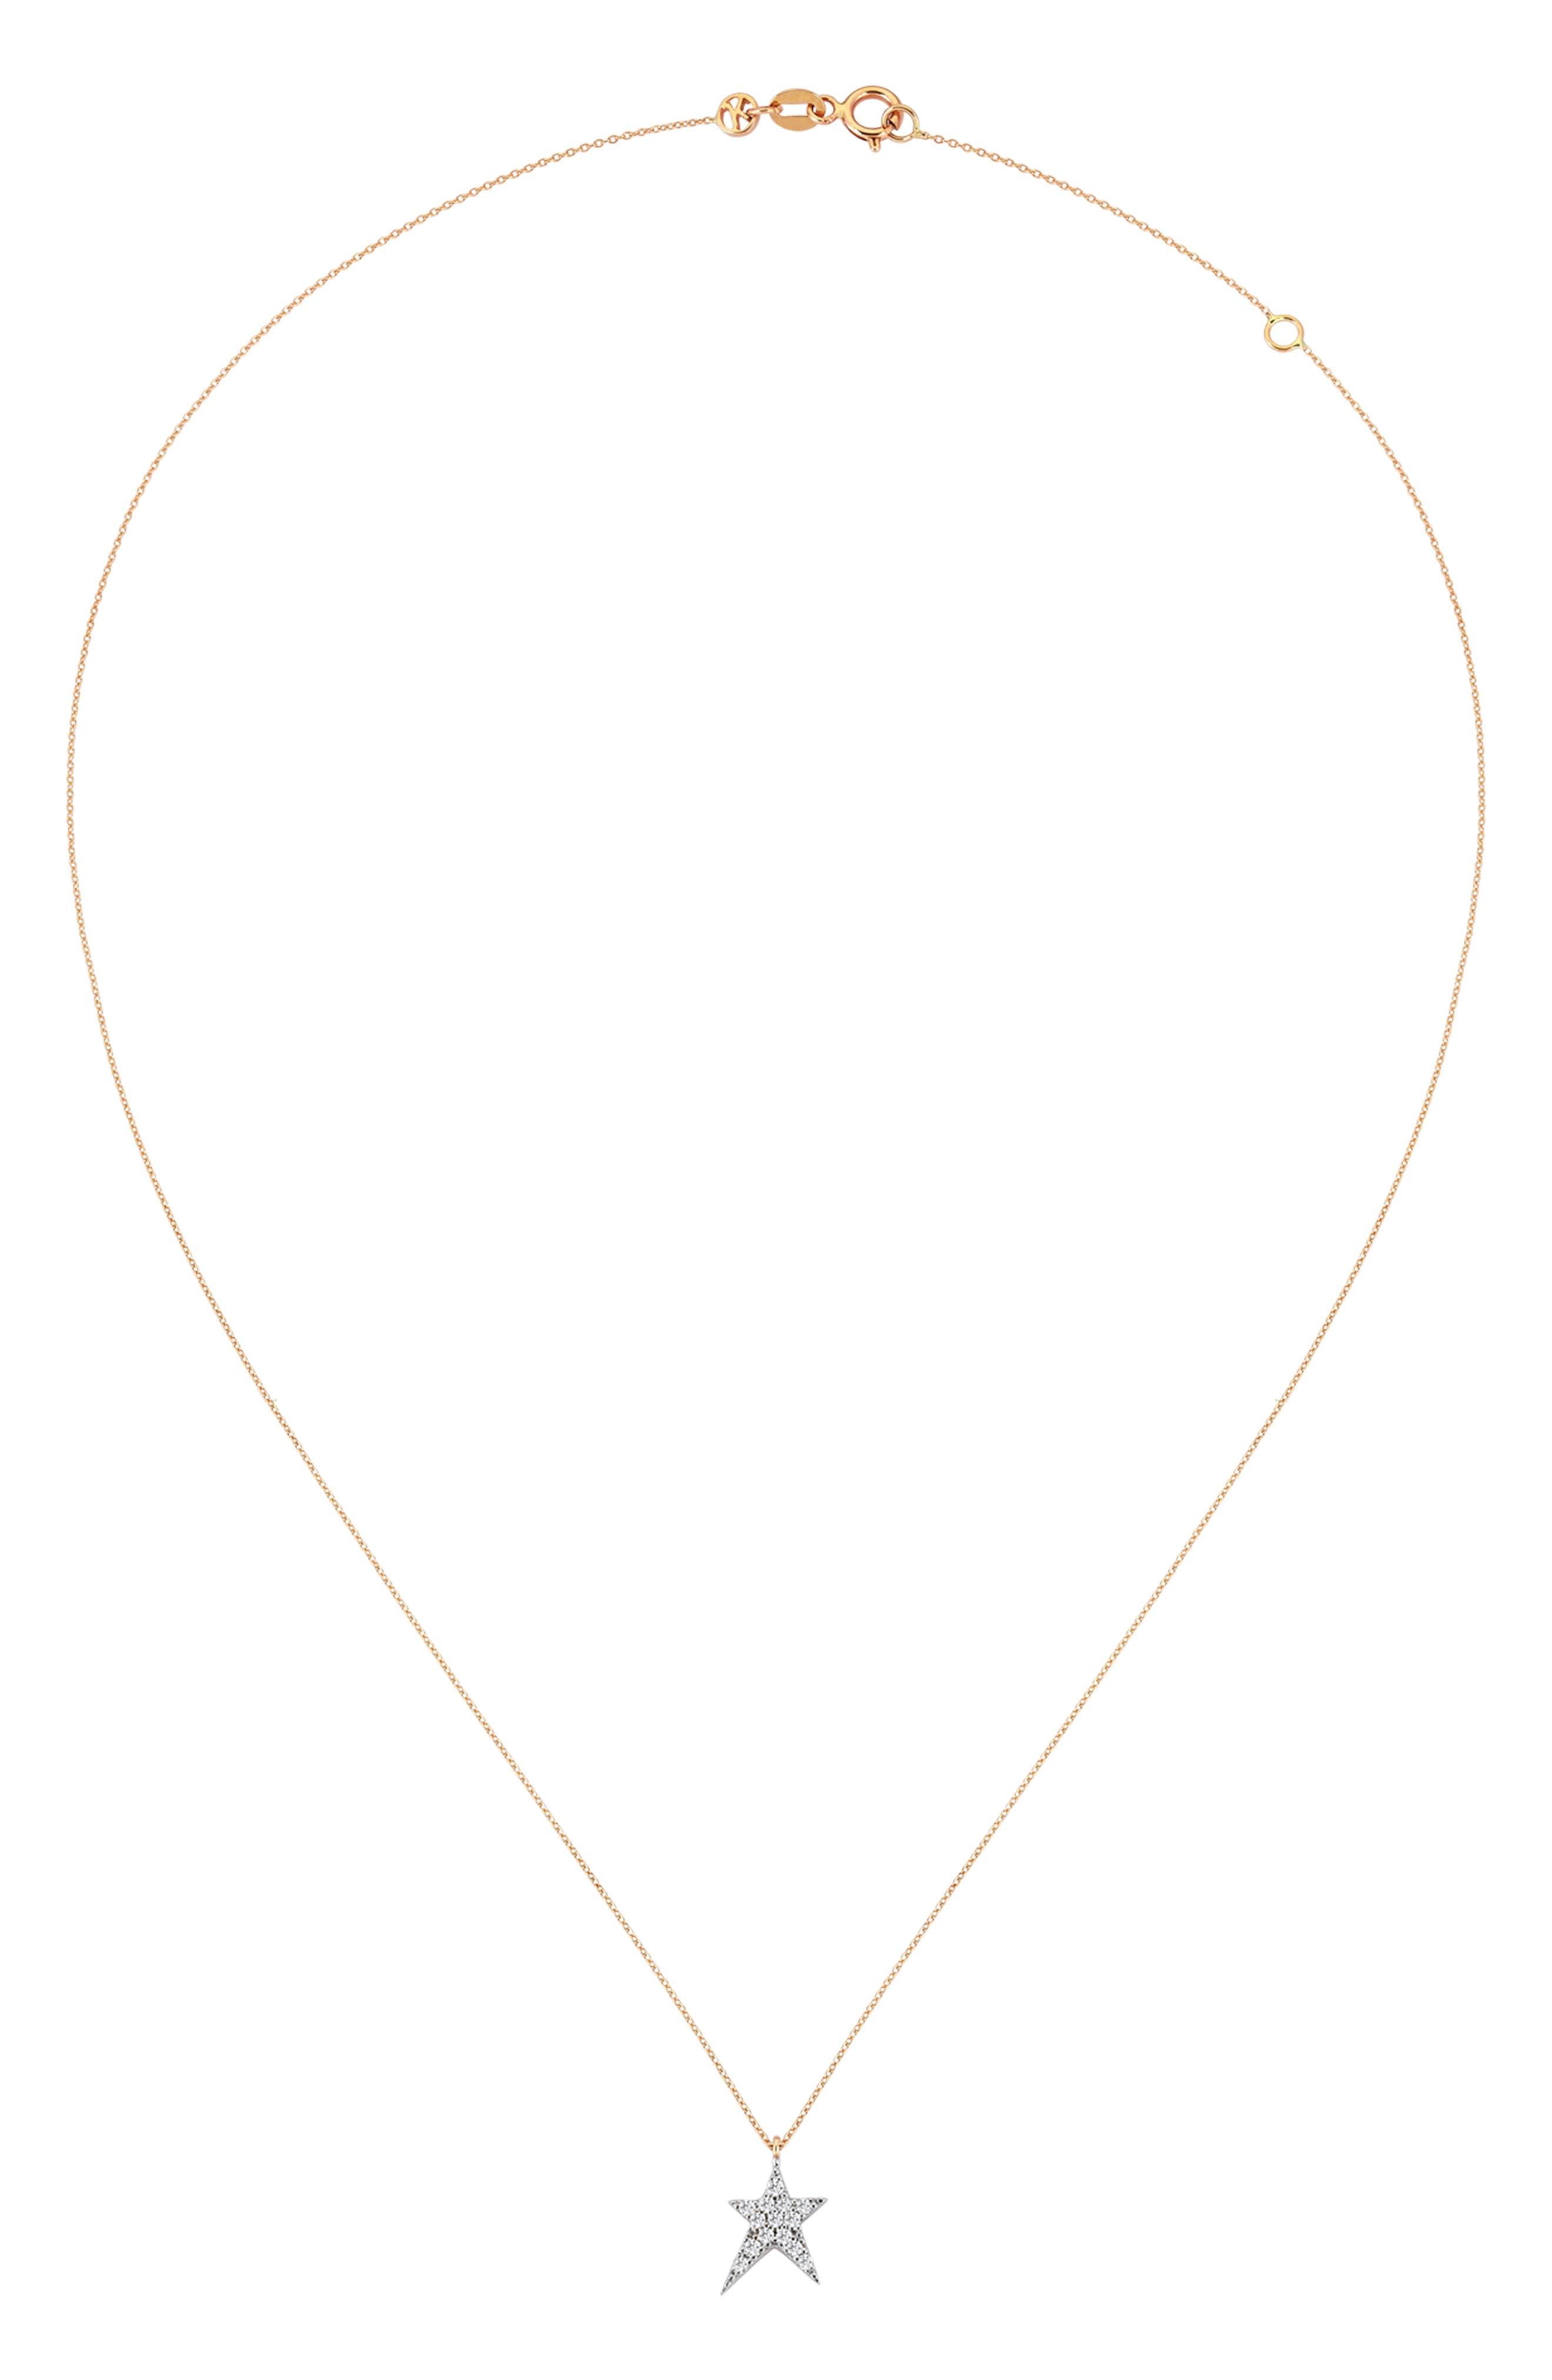 Diamond Star Pendant Necklace,                             Alternate thumbnail 2, color,                             Rose Gold